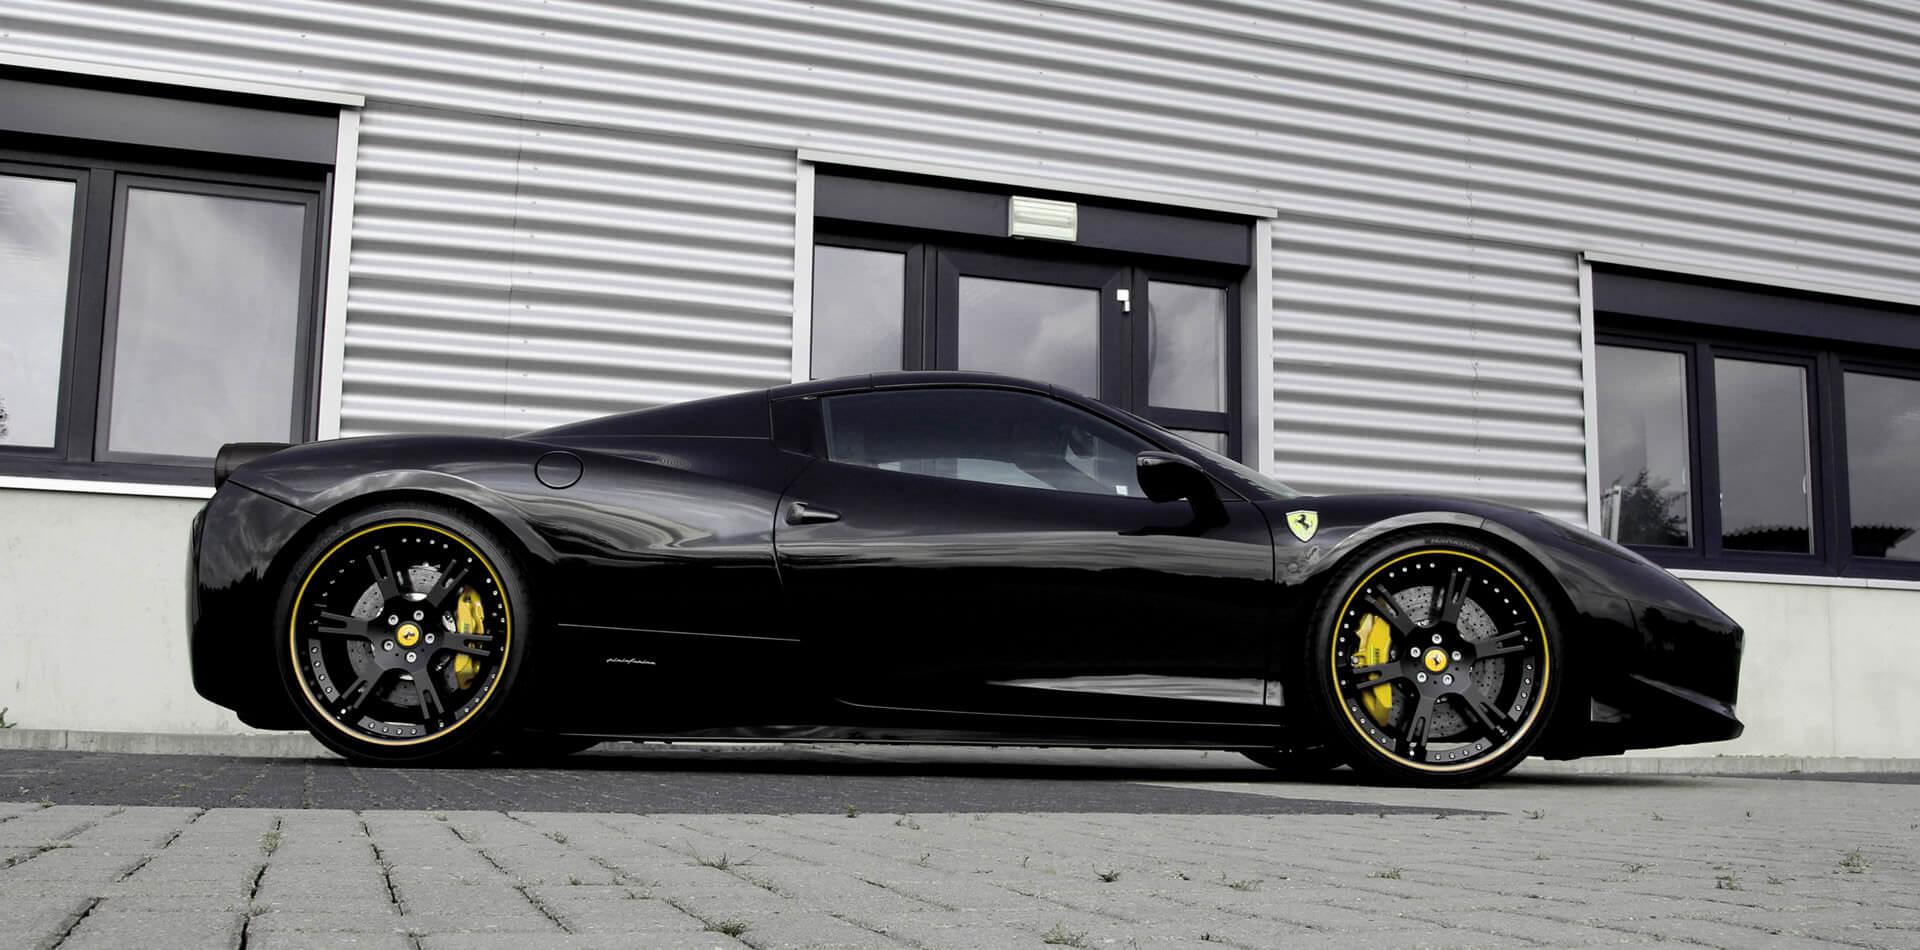 Ferrari 458 Italia Tuning, Felgen, Auspuffanlage